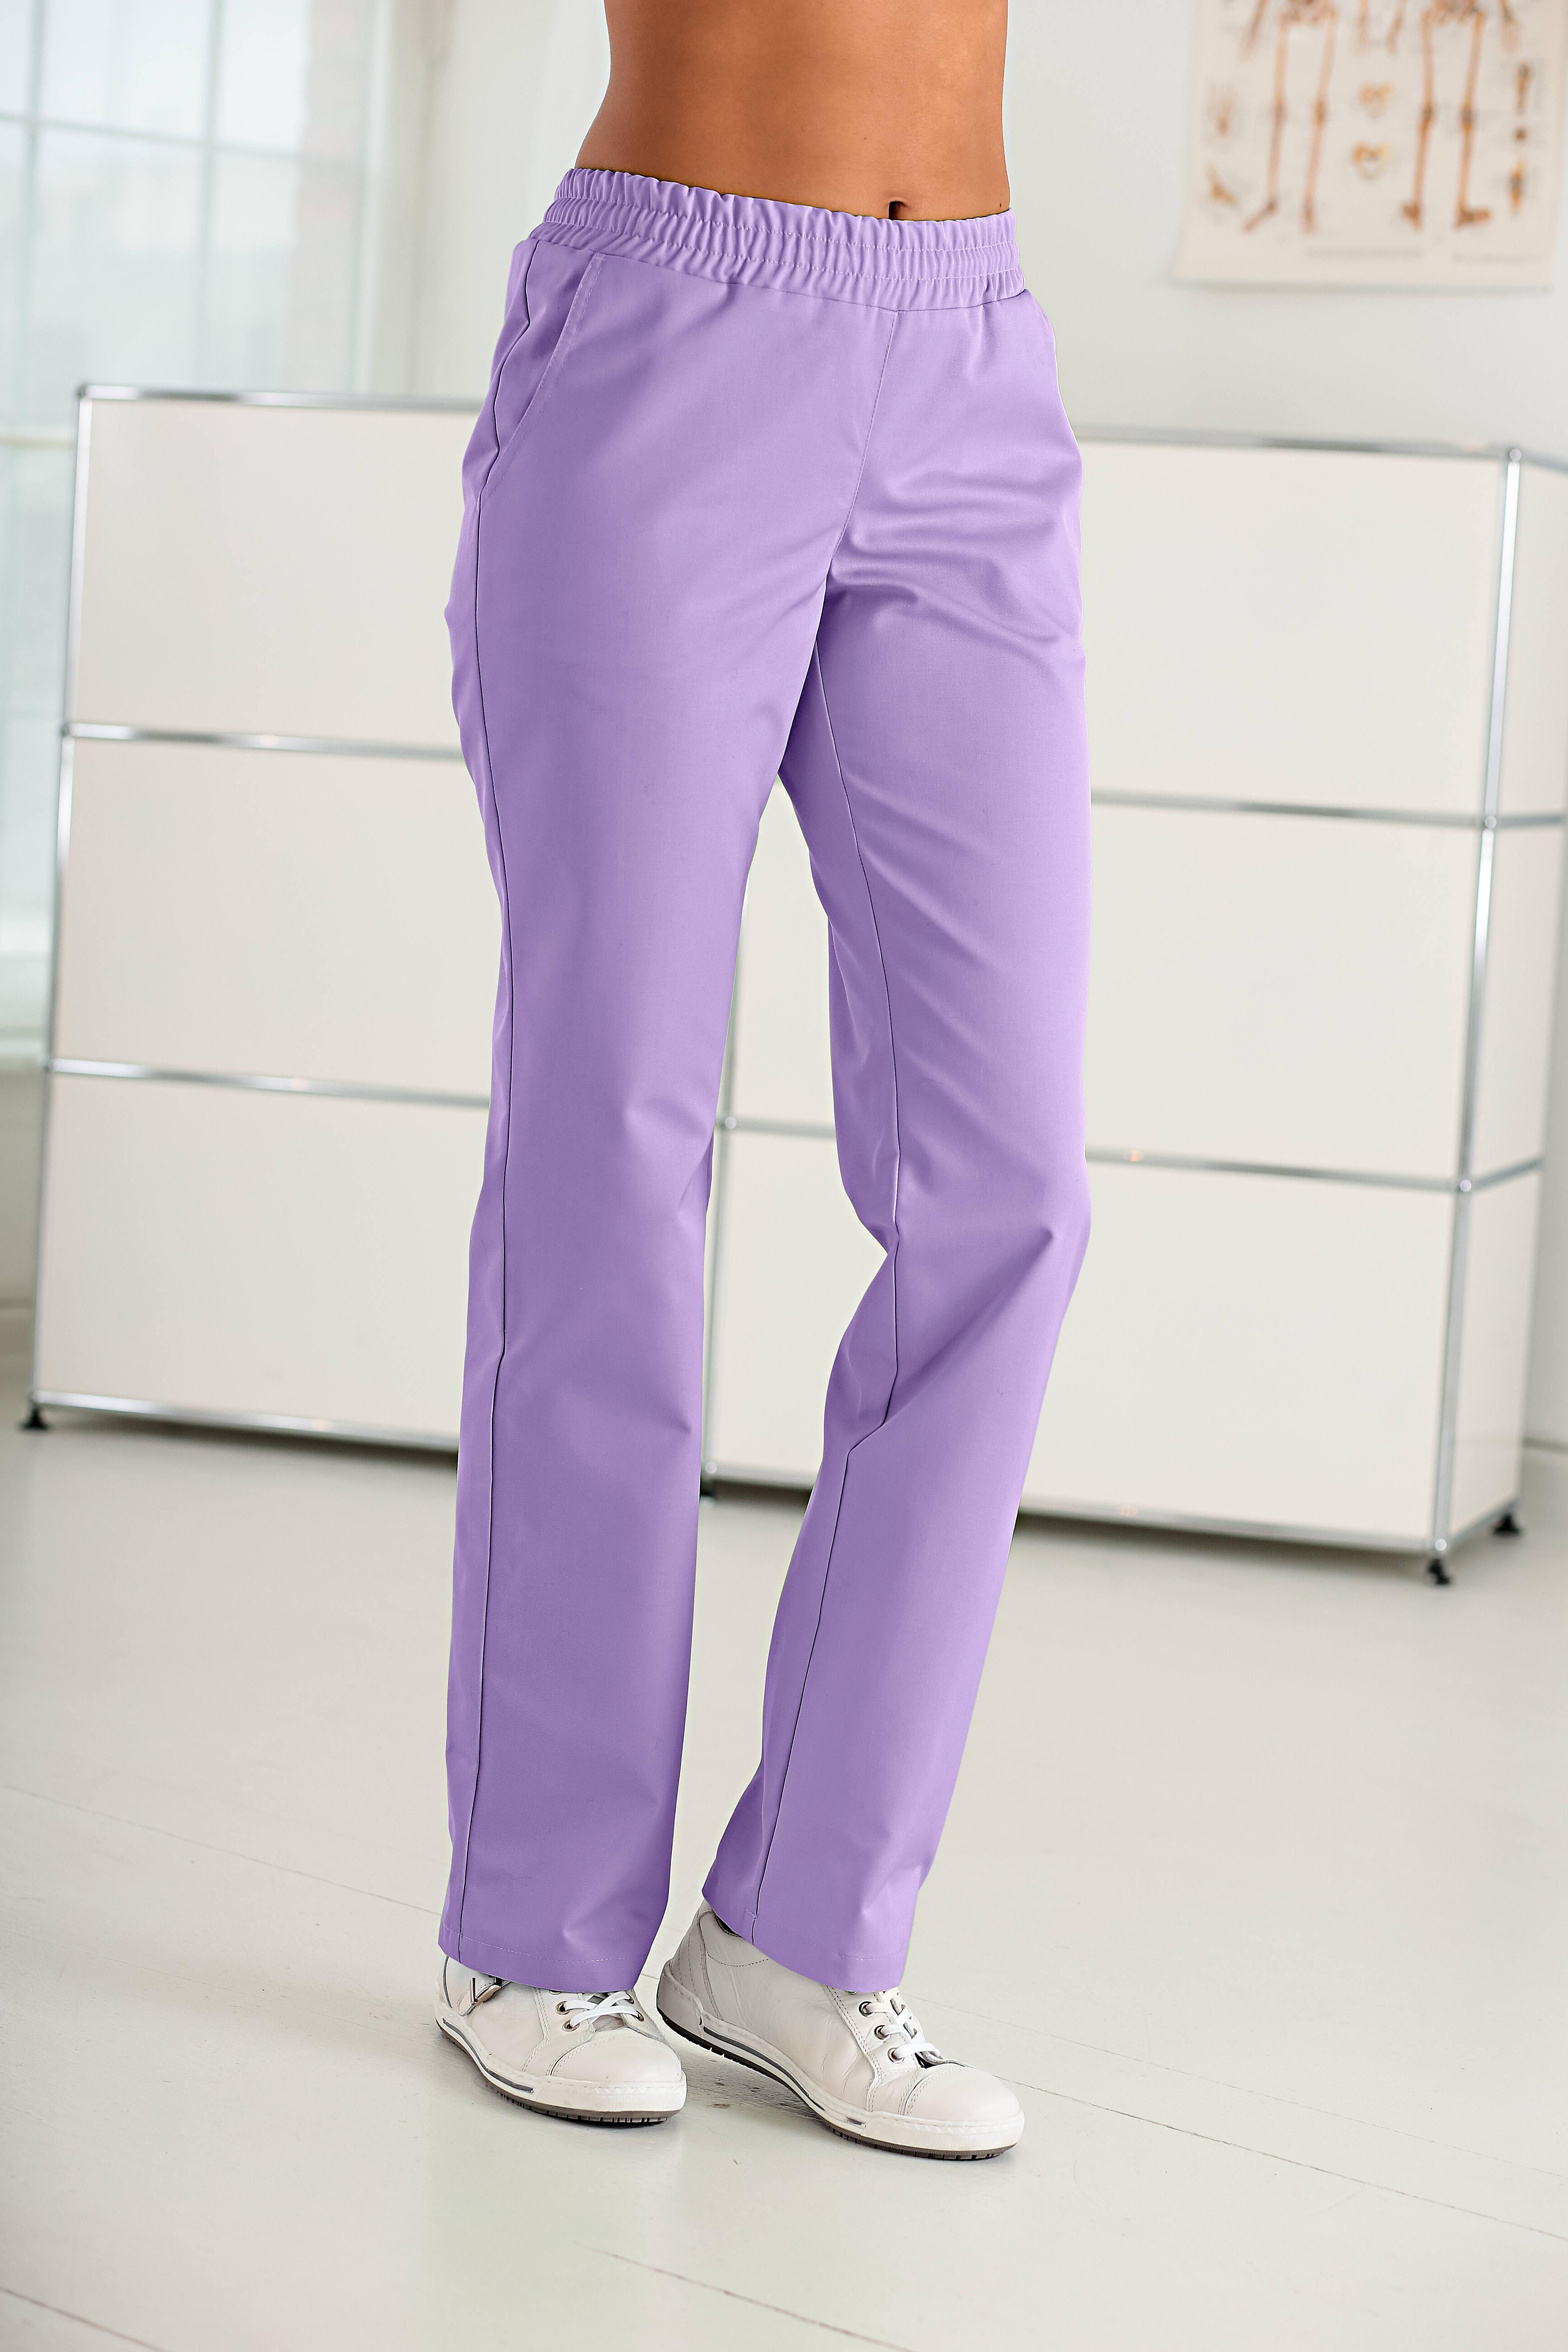 Dress Femme Clinic Baskets H4w1fqf Violettes gHqnxWZtB